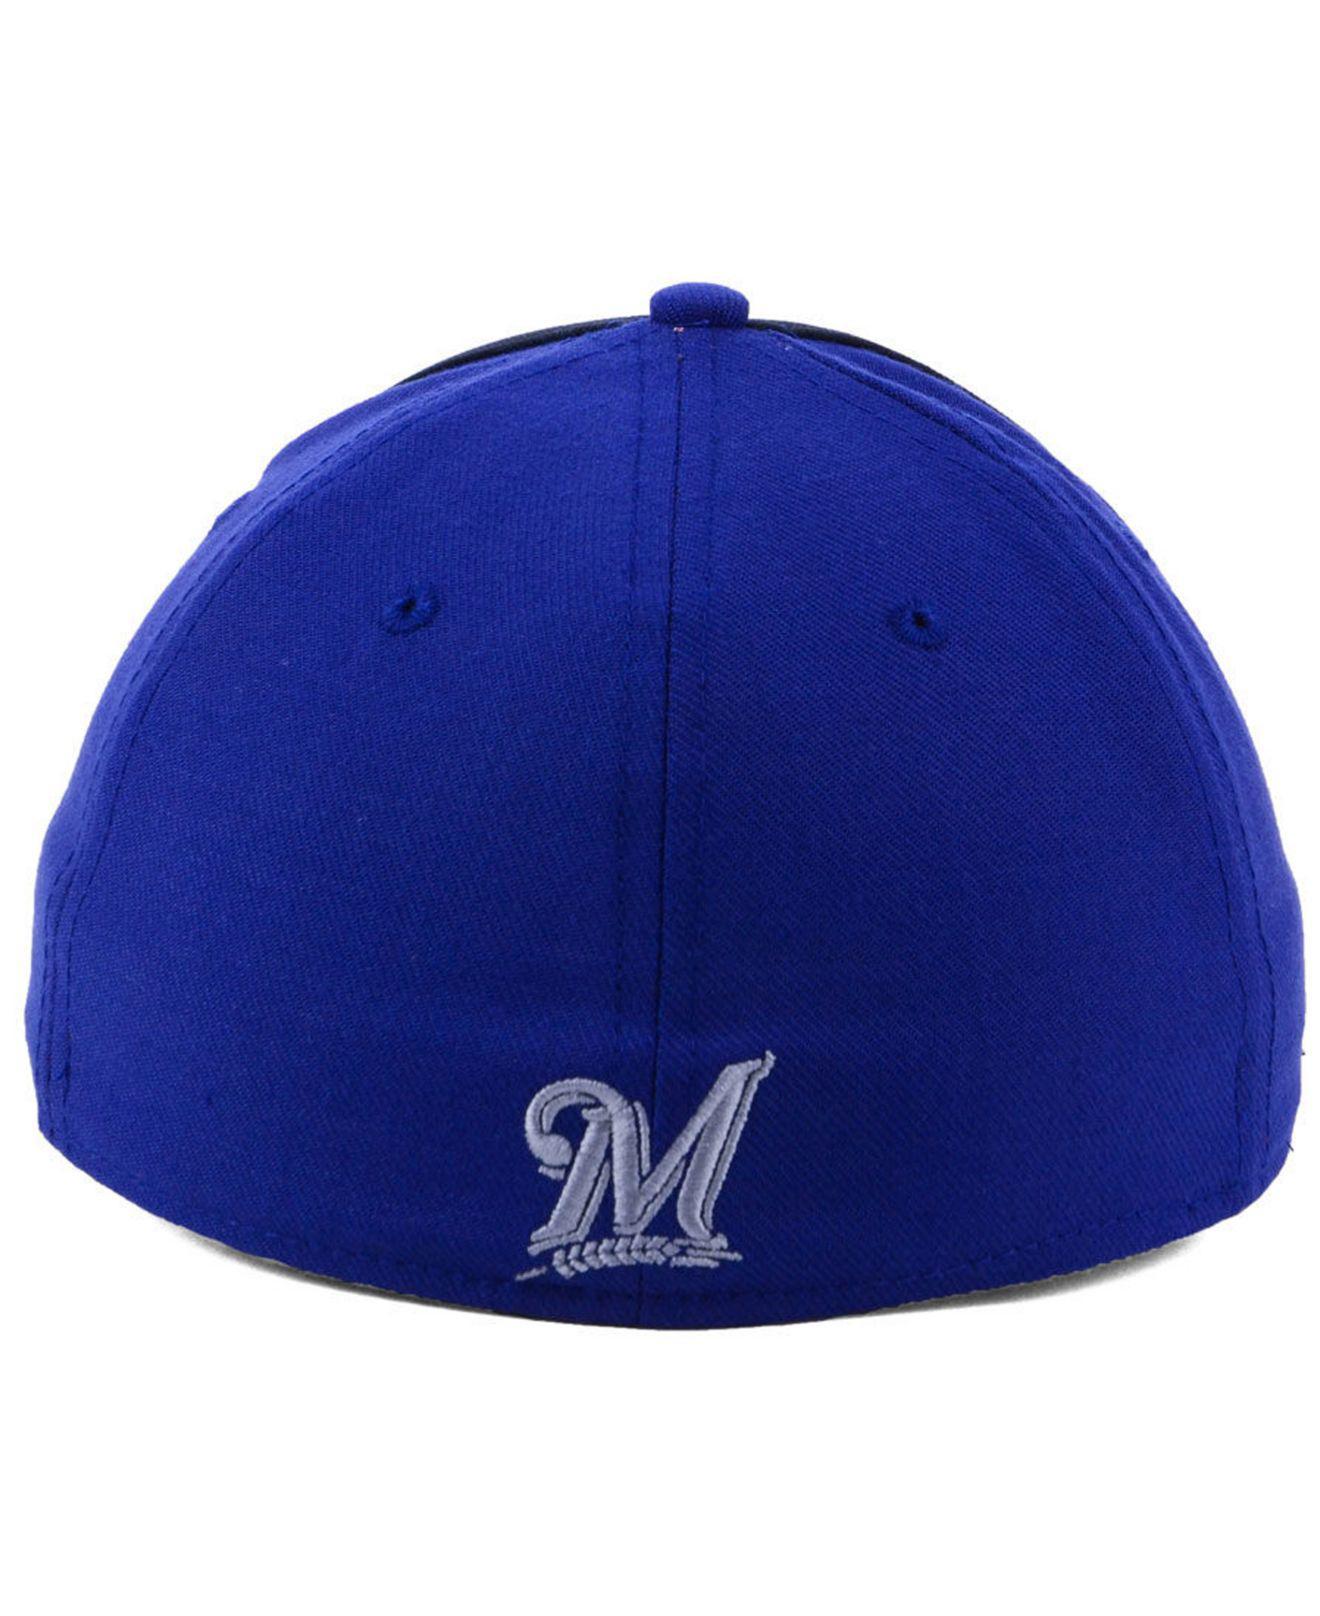 finest selection a3e48 bd3cb ... netherlands nike blue milwaukee brewers team color reflective swooshflex  cap for men lyst. view fullscreen